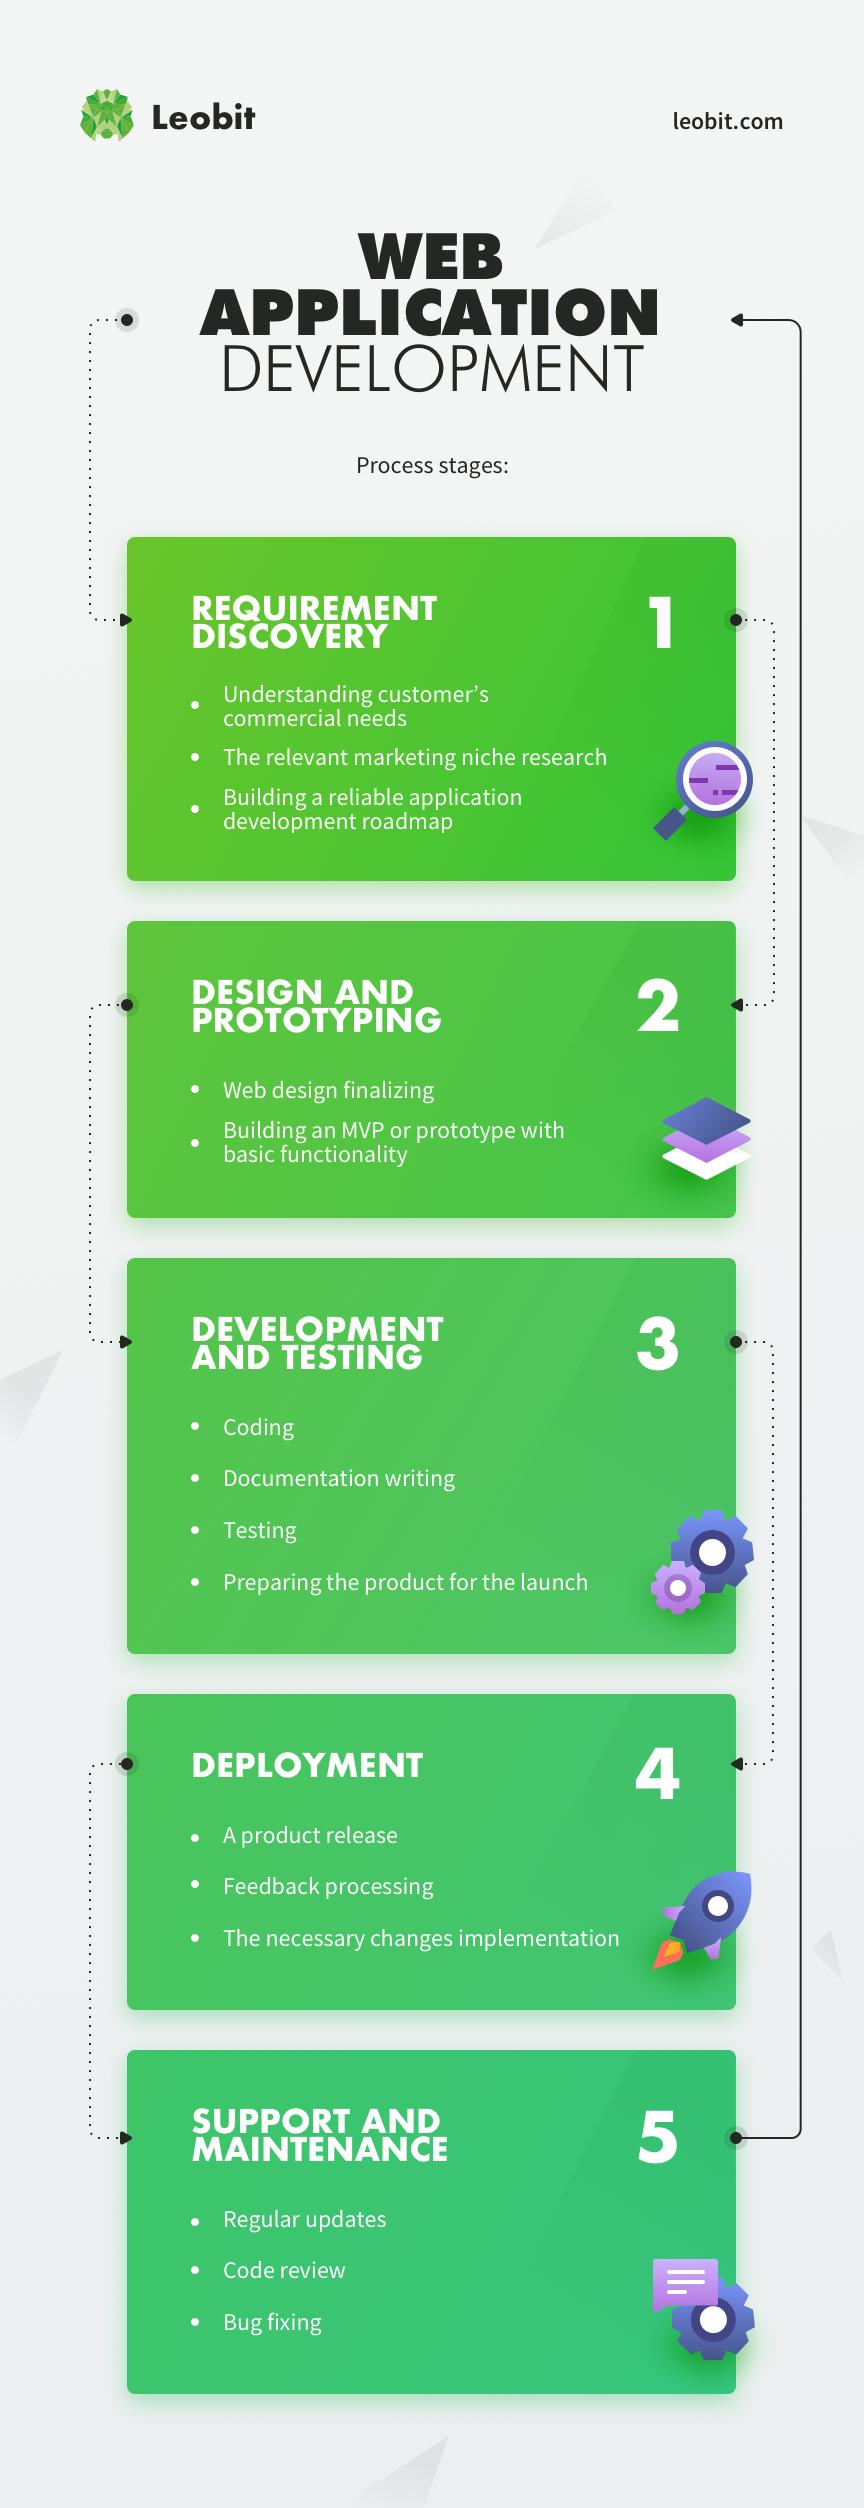 Web Application Development Process